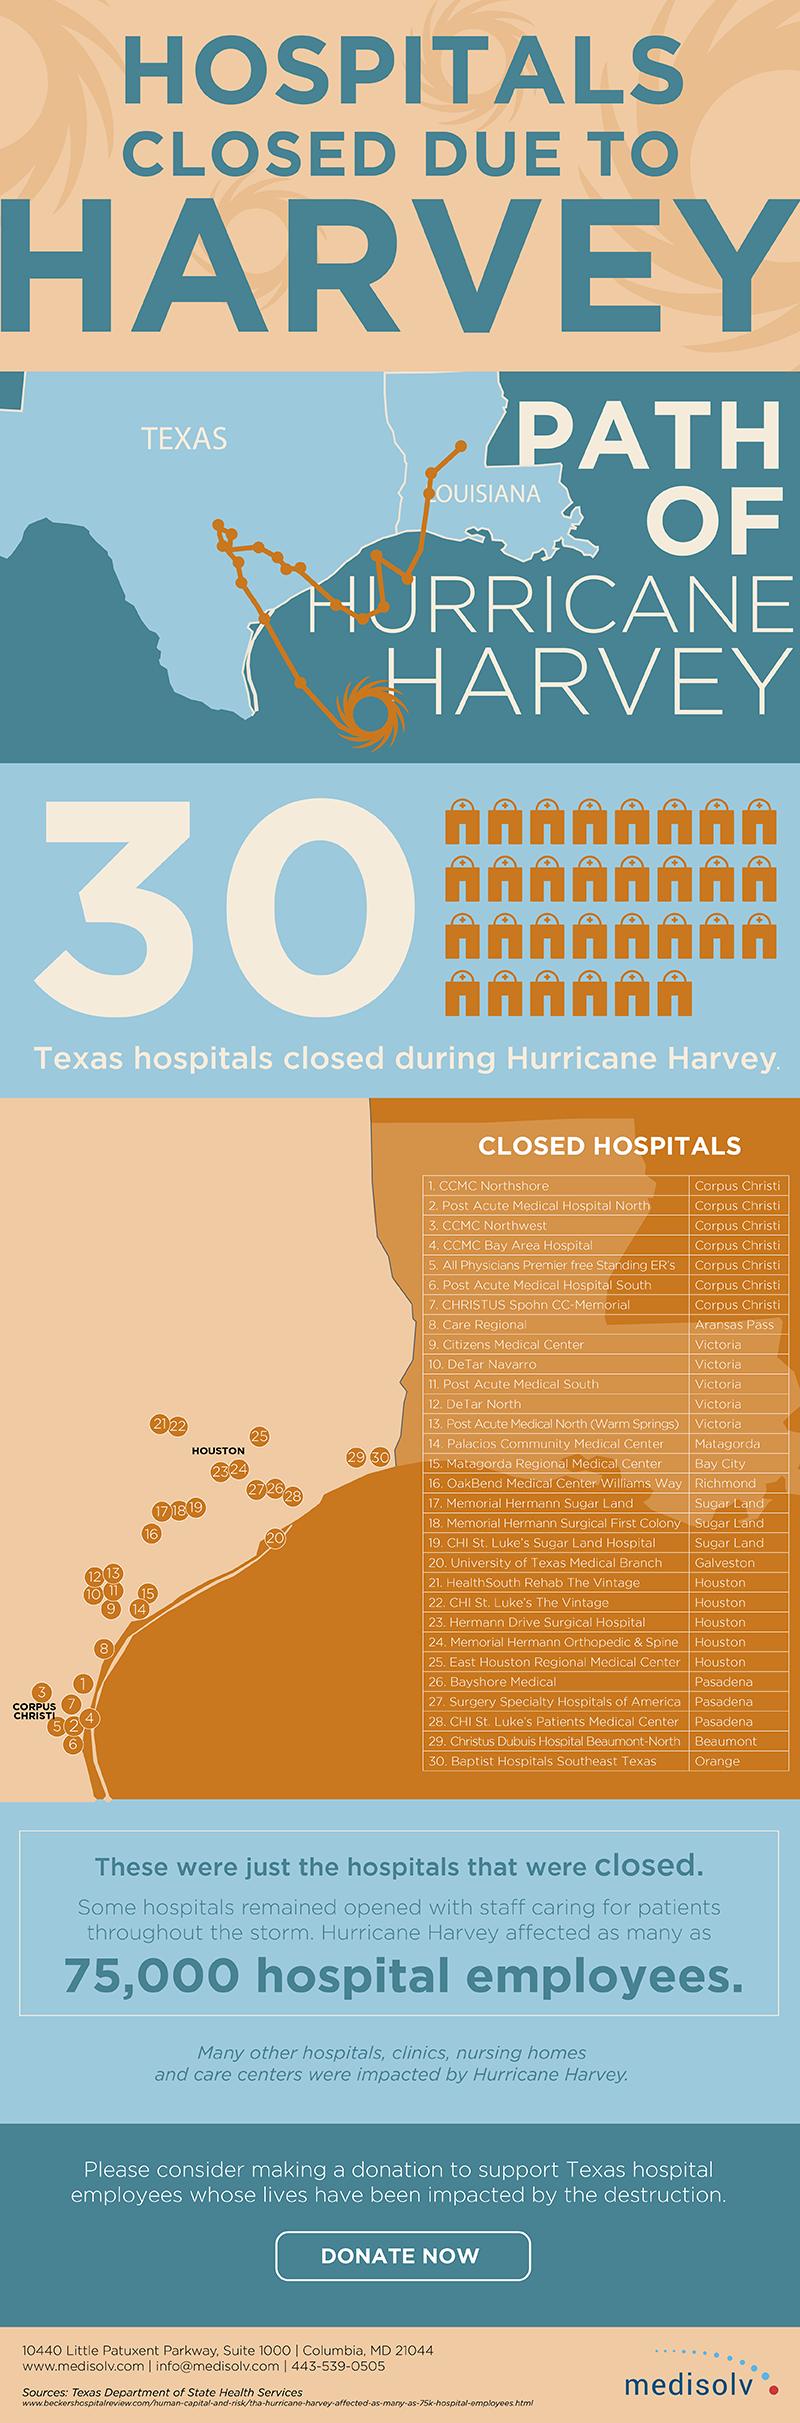 hurricane-harvey-hospitals-closed-01.png